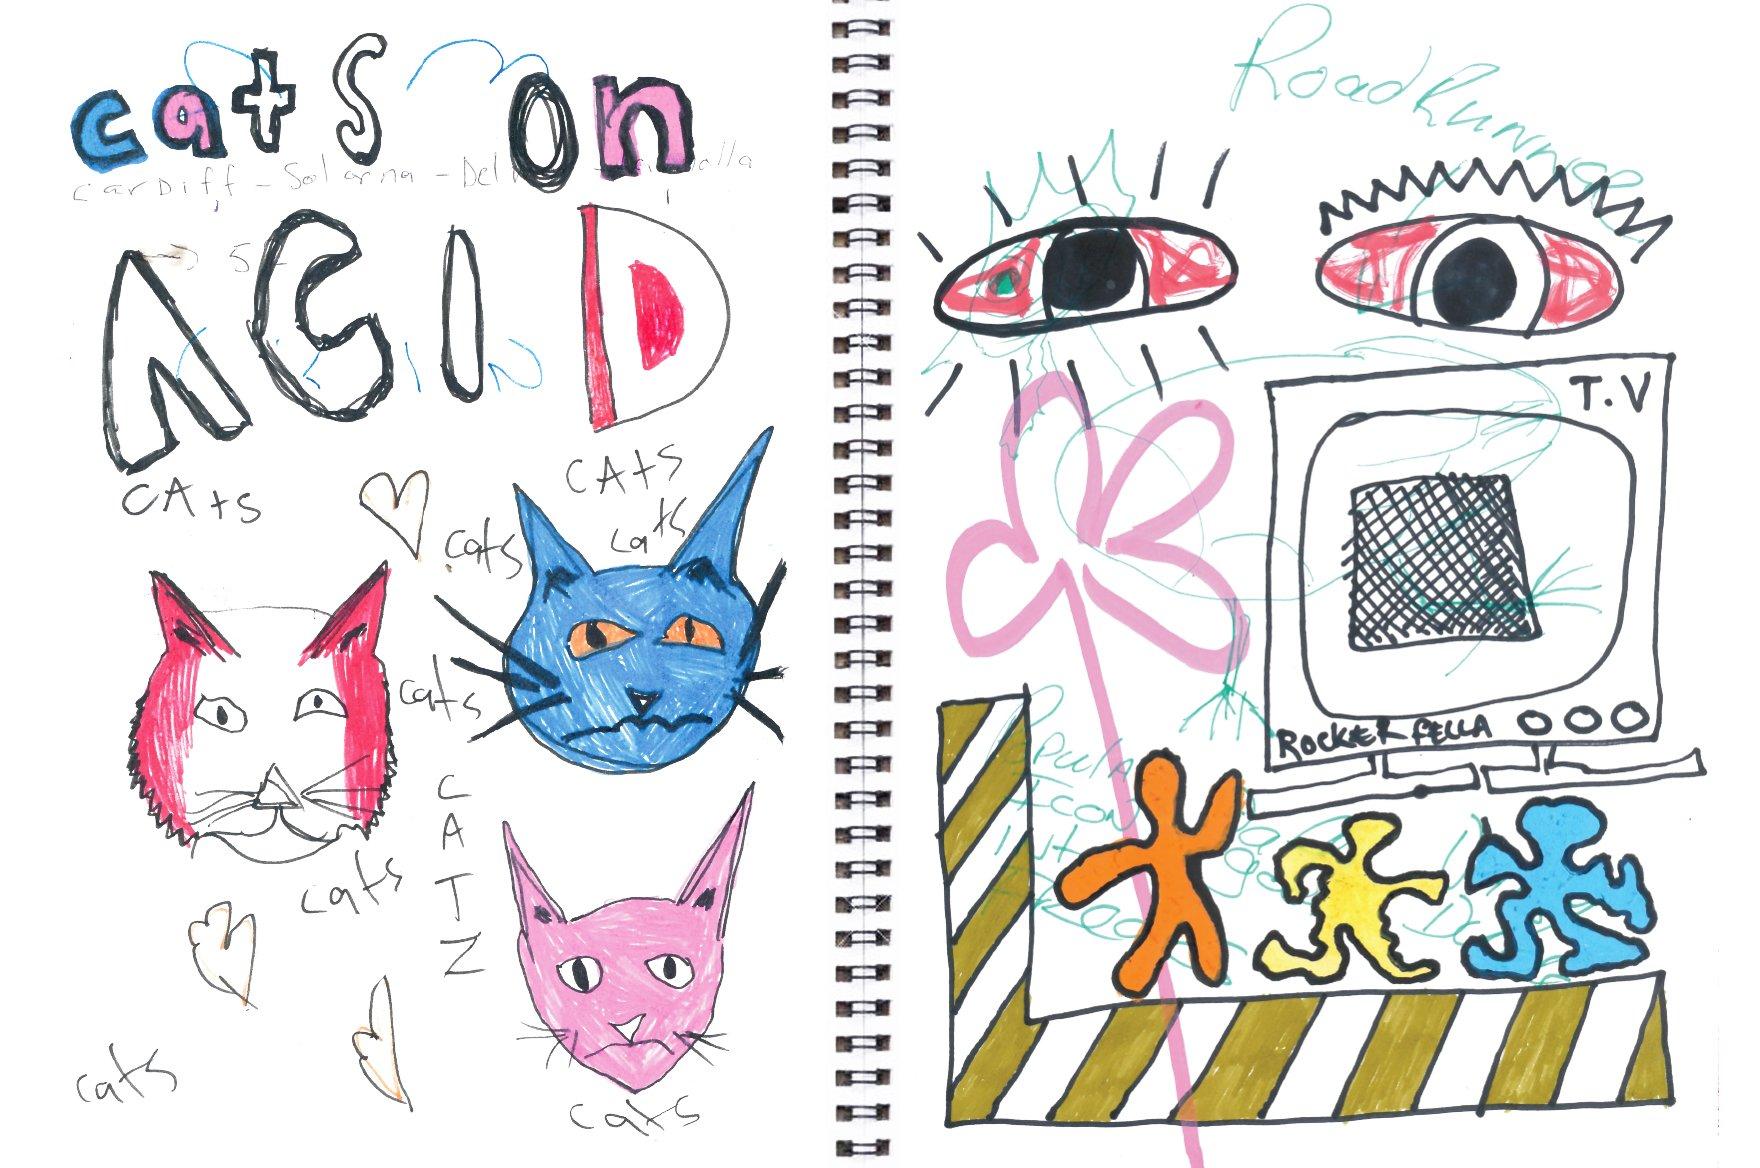 Afends-ACID CAT、 トリッピーなカプセルコレクション